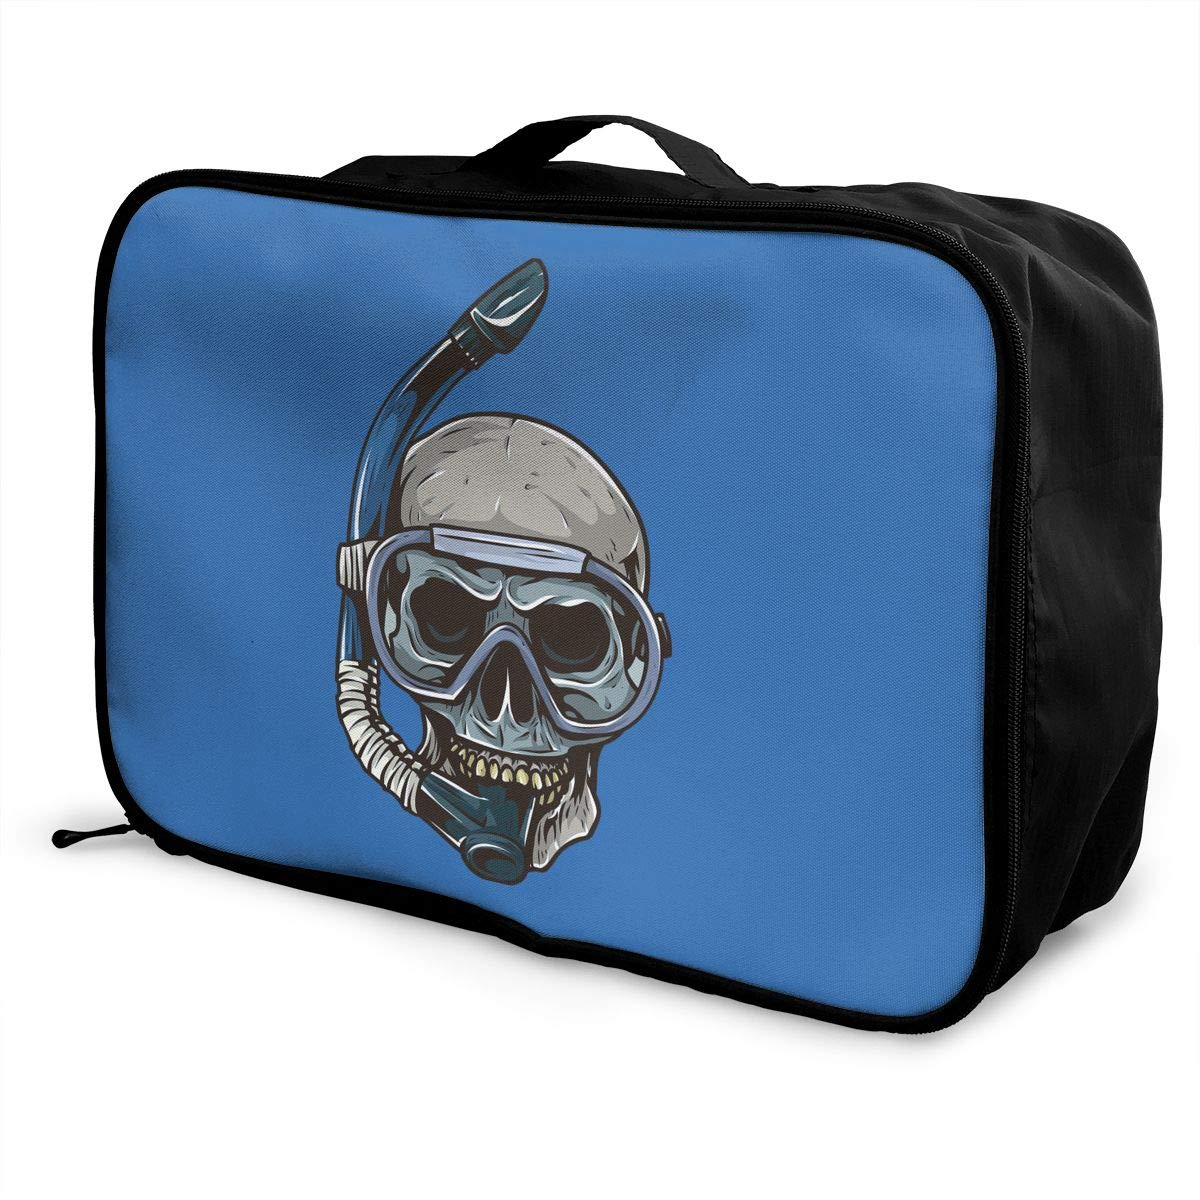 Travel Luggage Duffle Bag Lightweight Portable Handbag Diving Skull Large Capacity Waterproof Foldable Storage Tote